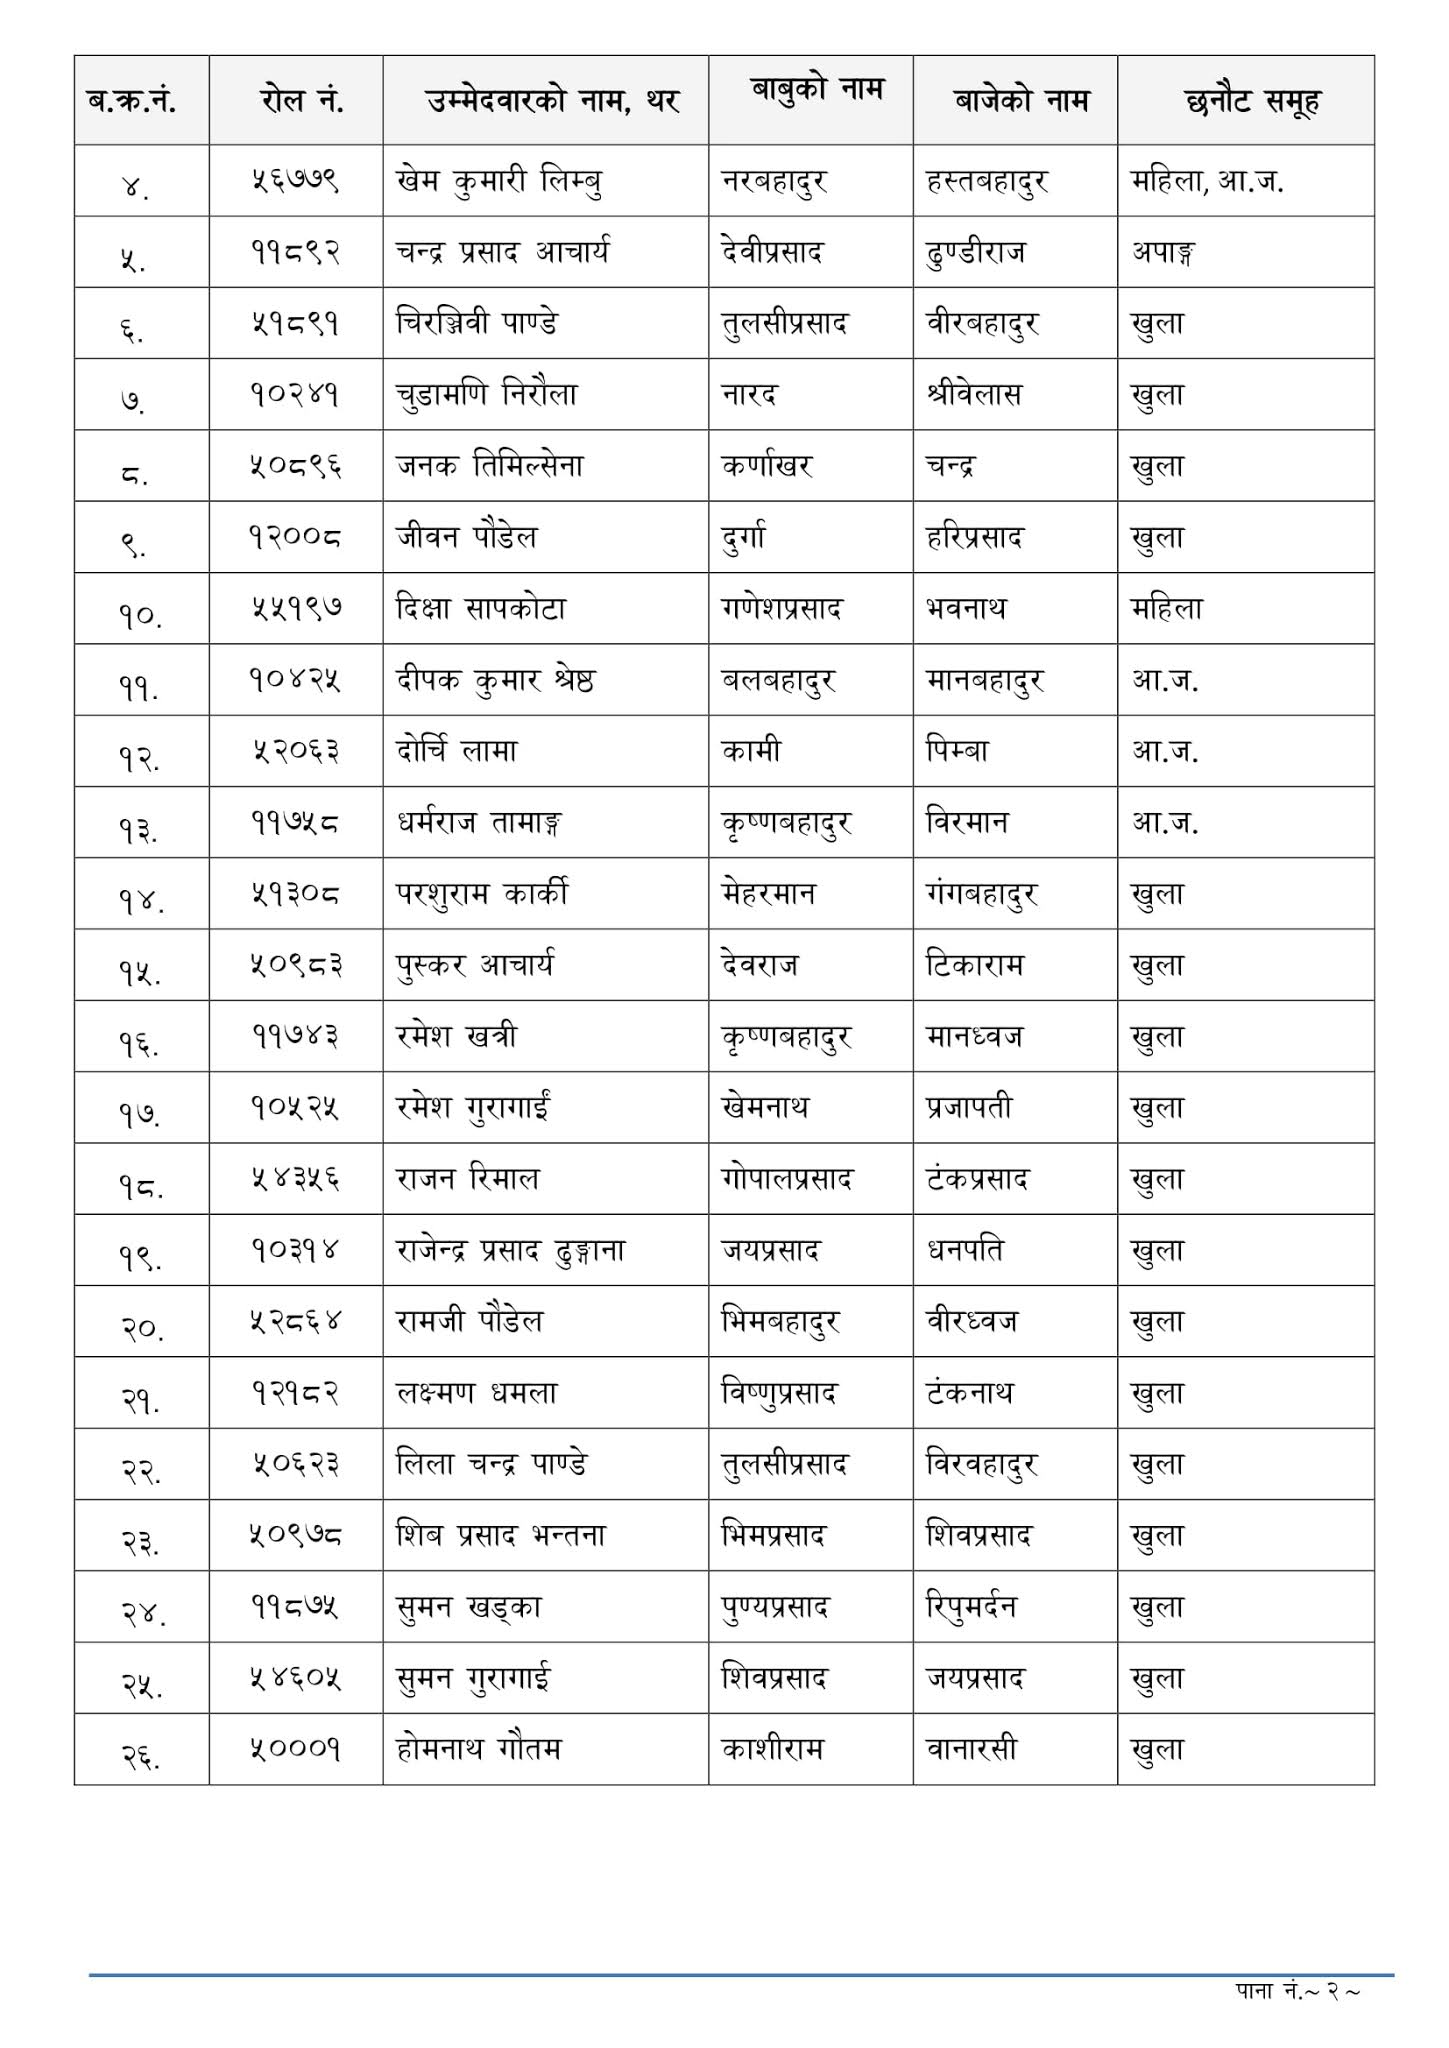 NASU Account - Dhankuta Lok Sewa Aayog Written Exam Result & Exam Schedule